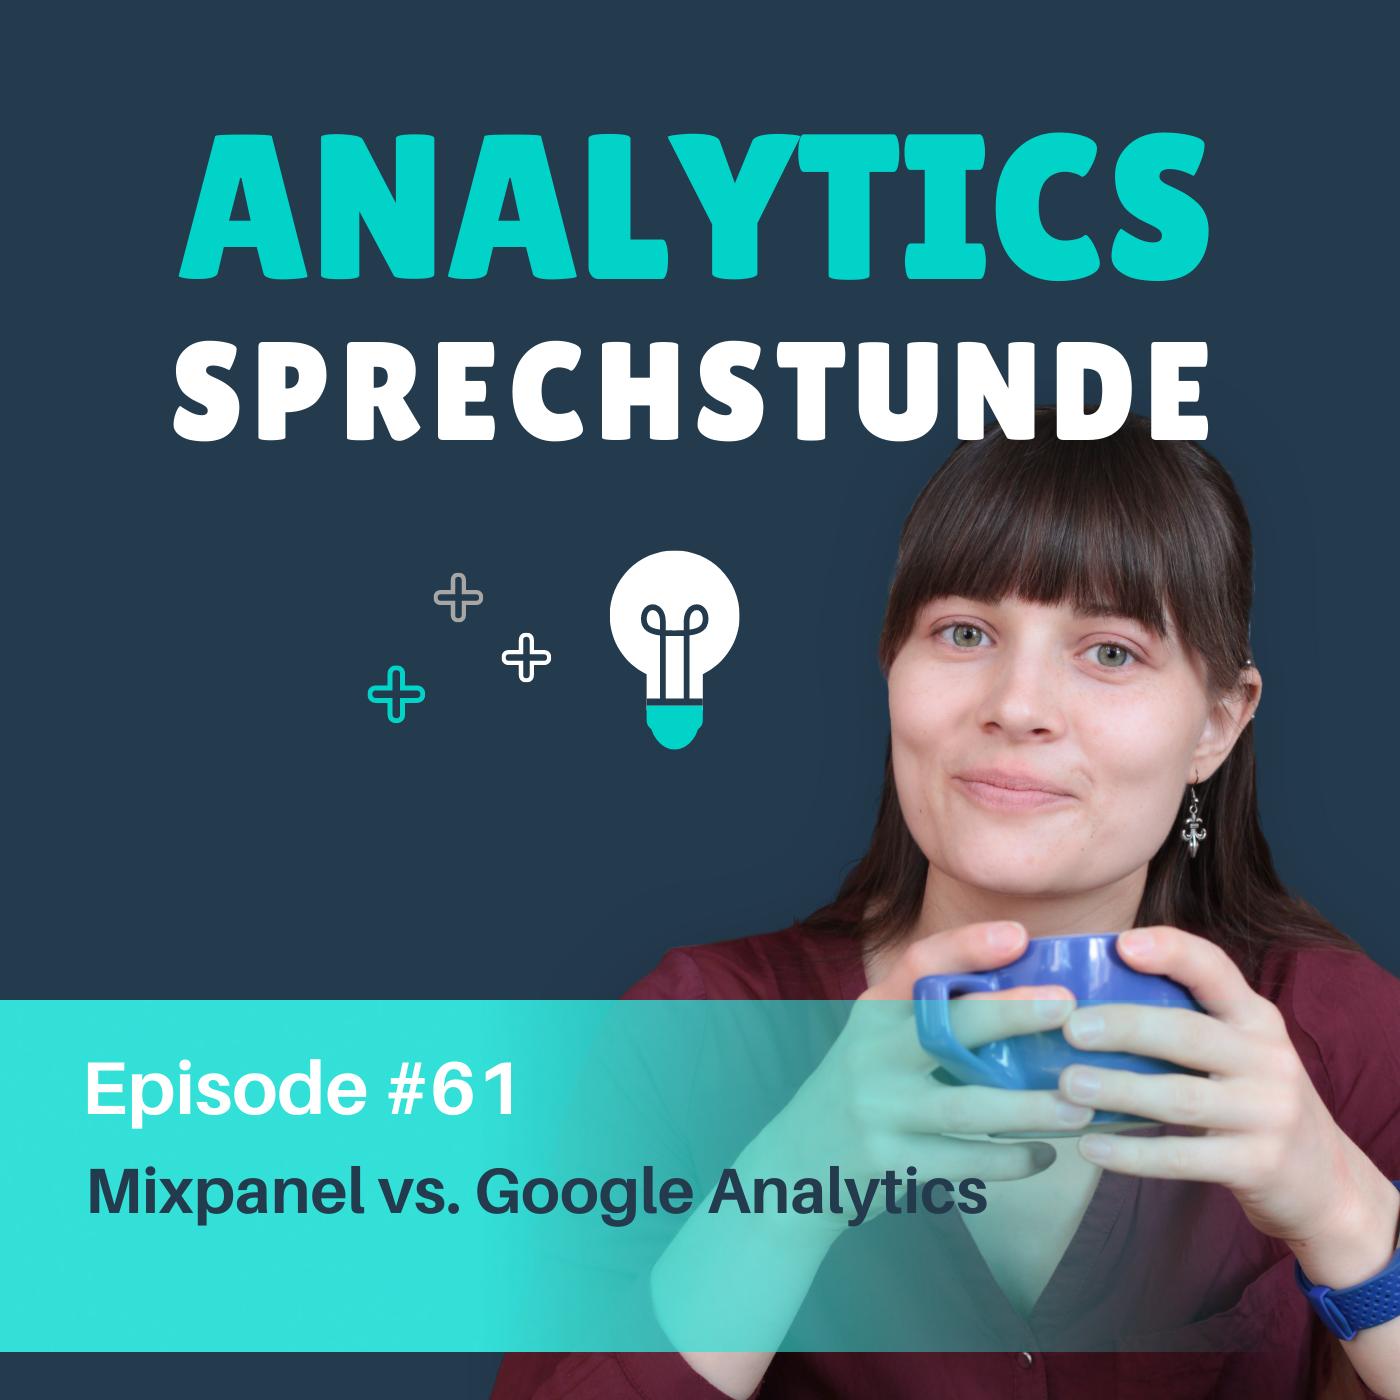 61 Mixpanel vs. Google Analytics